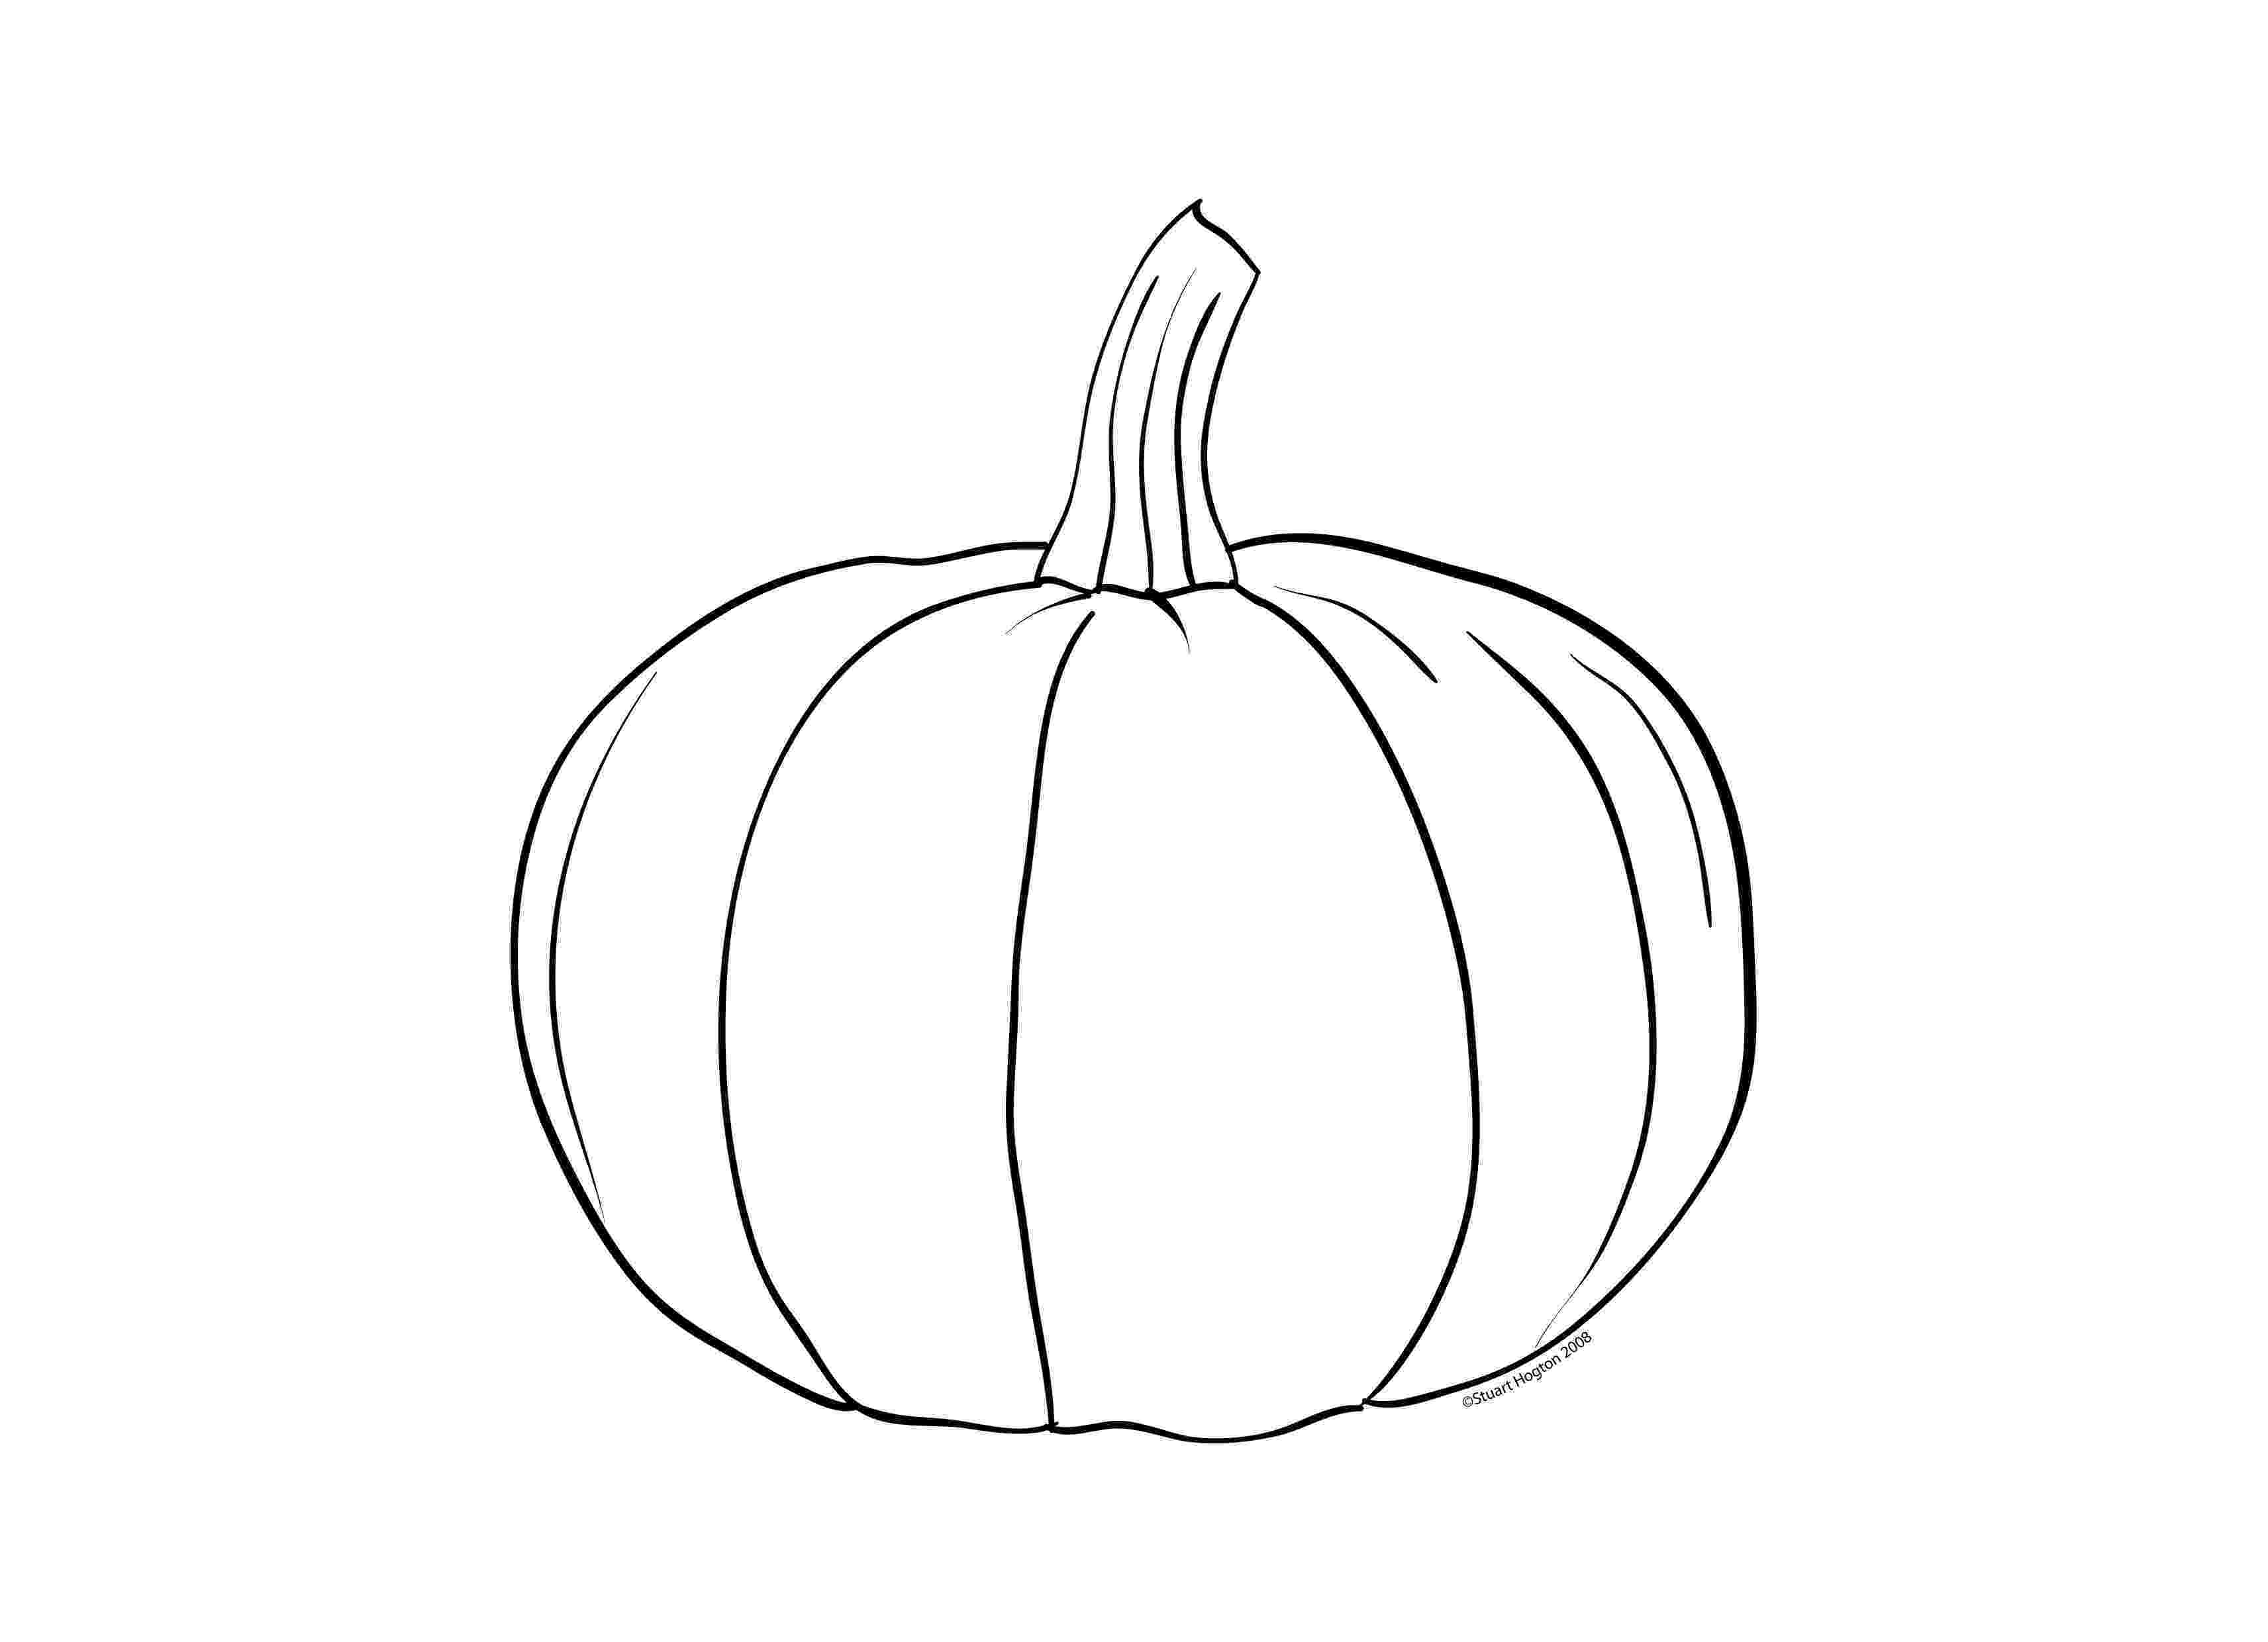 coloring pumpkin free printable pumpkin coloring pages for kids cool2bkids coloring pumpkin